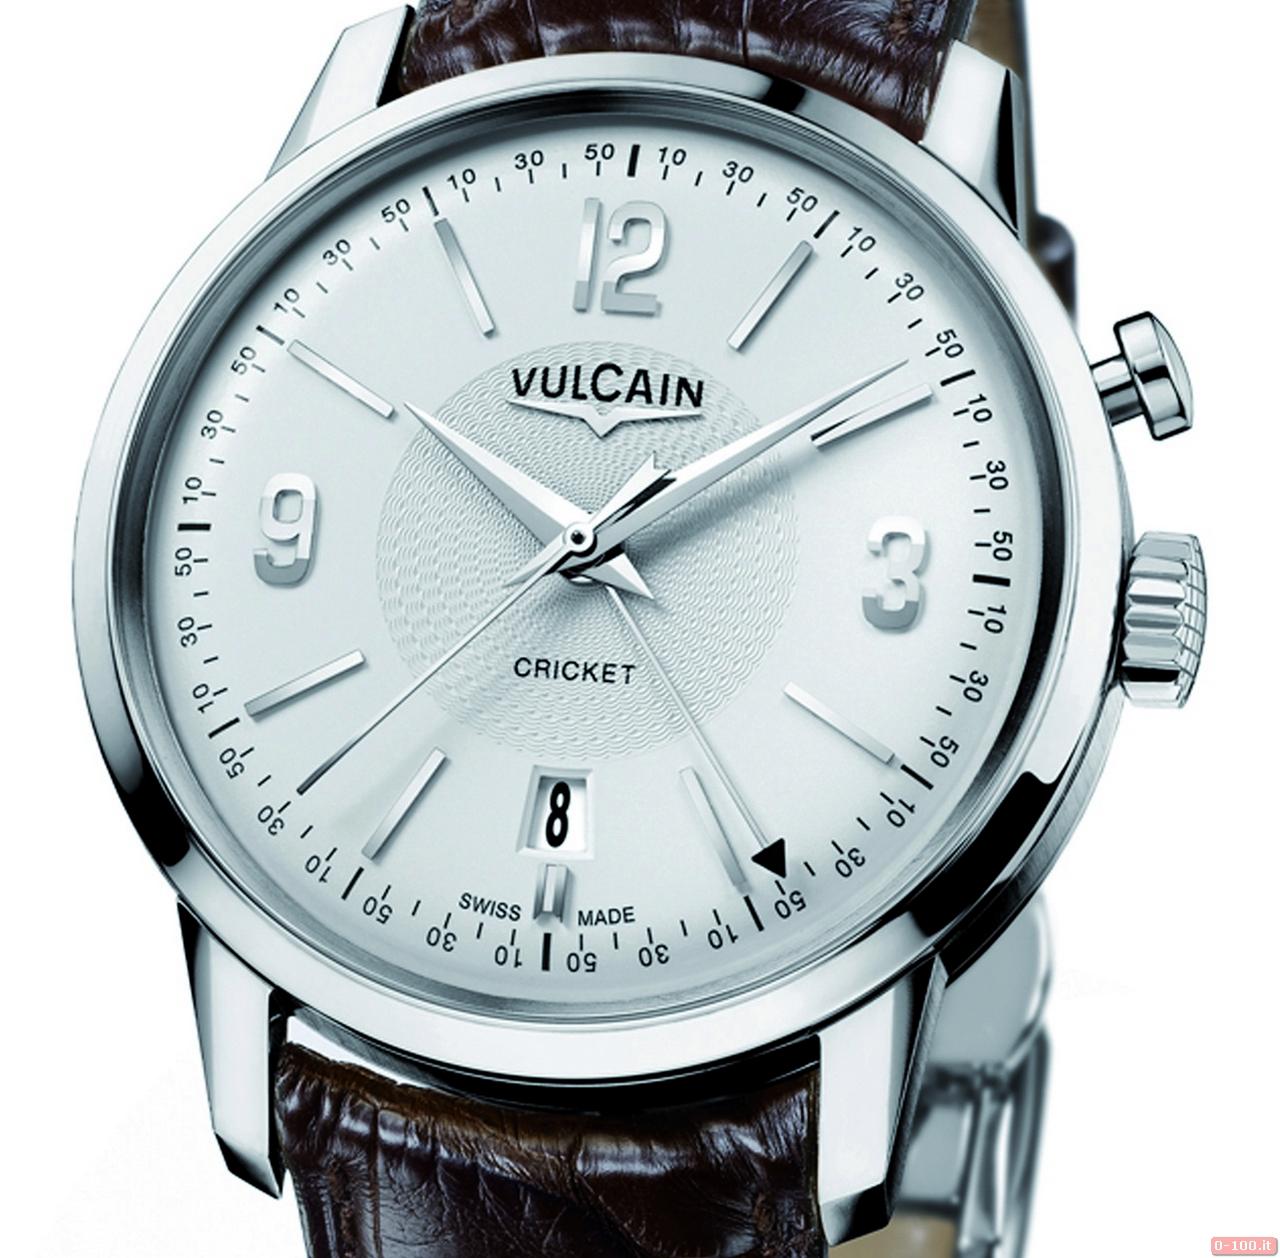 anteprima-baselword-2013-vulcain-50s-presidents-watch_0-100_1